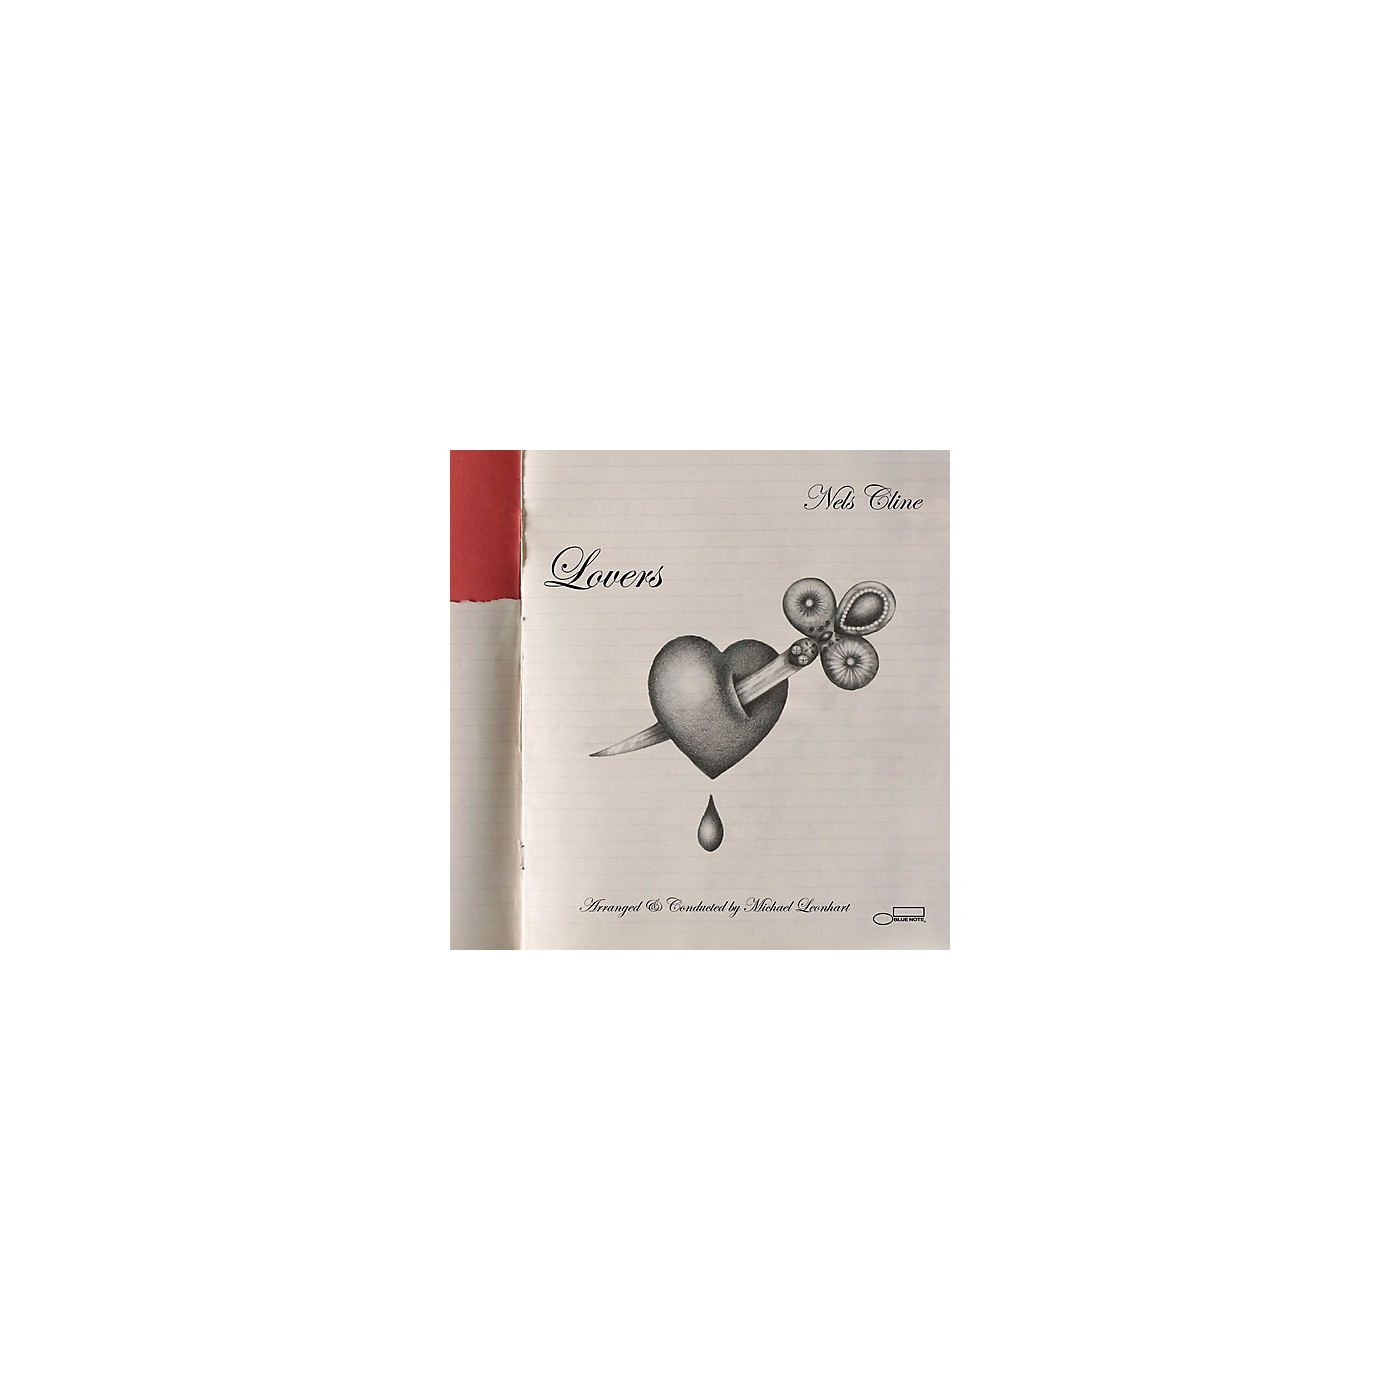 Alliance Nels Cline - Lovers thumbnail